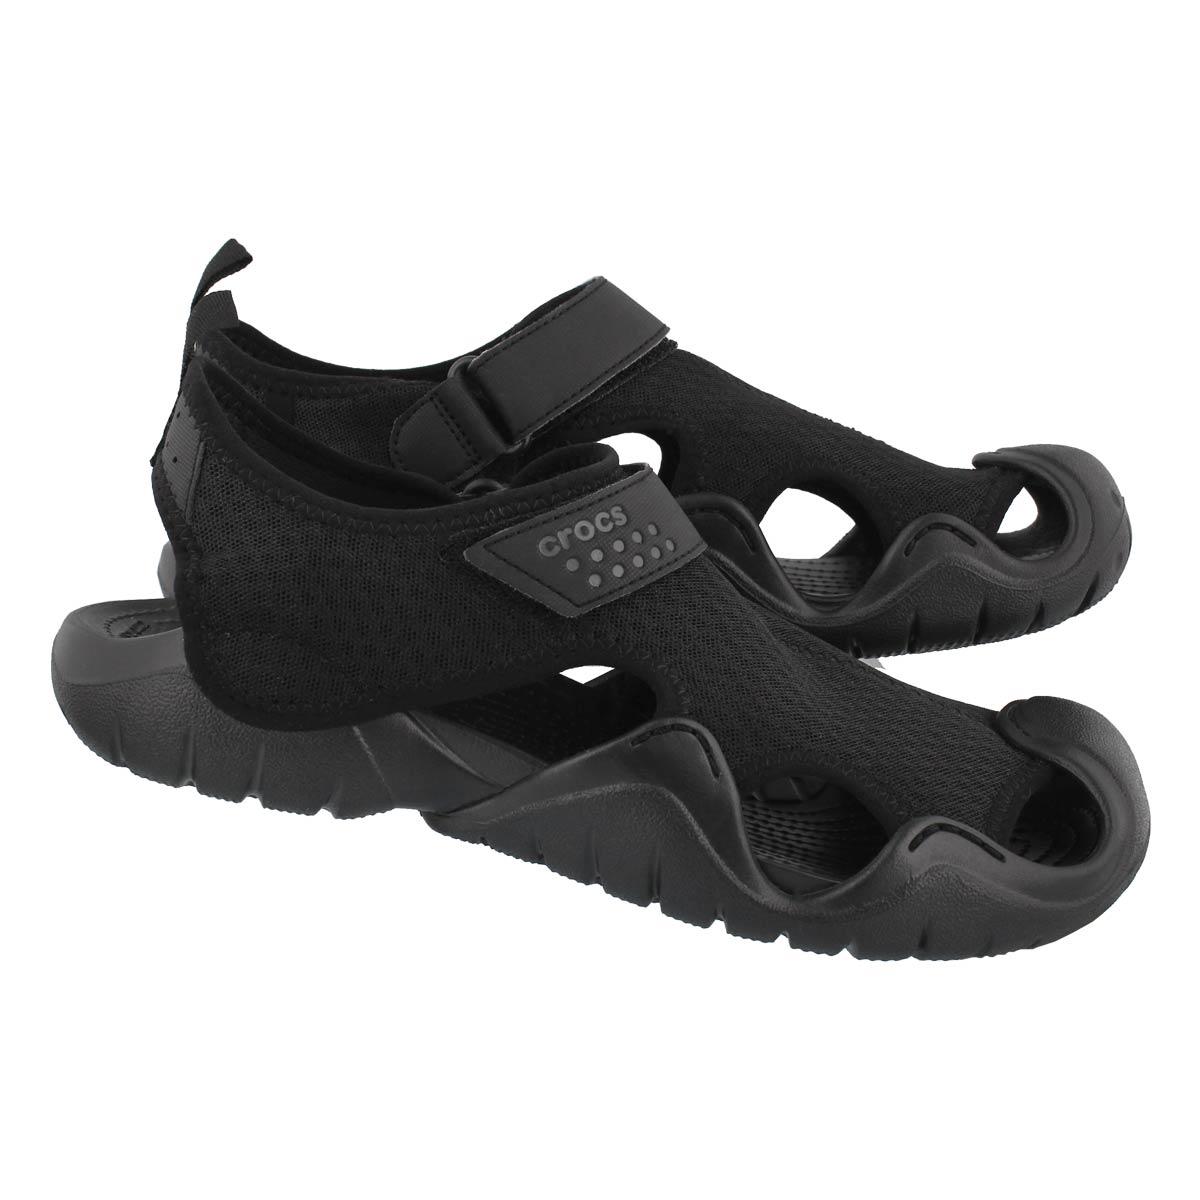 Mns Swiftwater blk/blk fisherman sandal